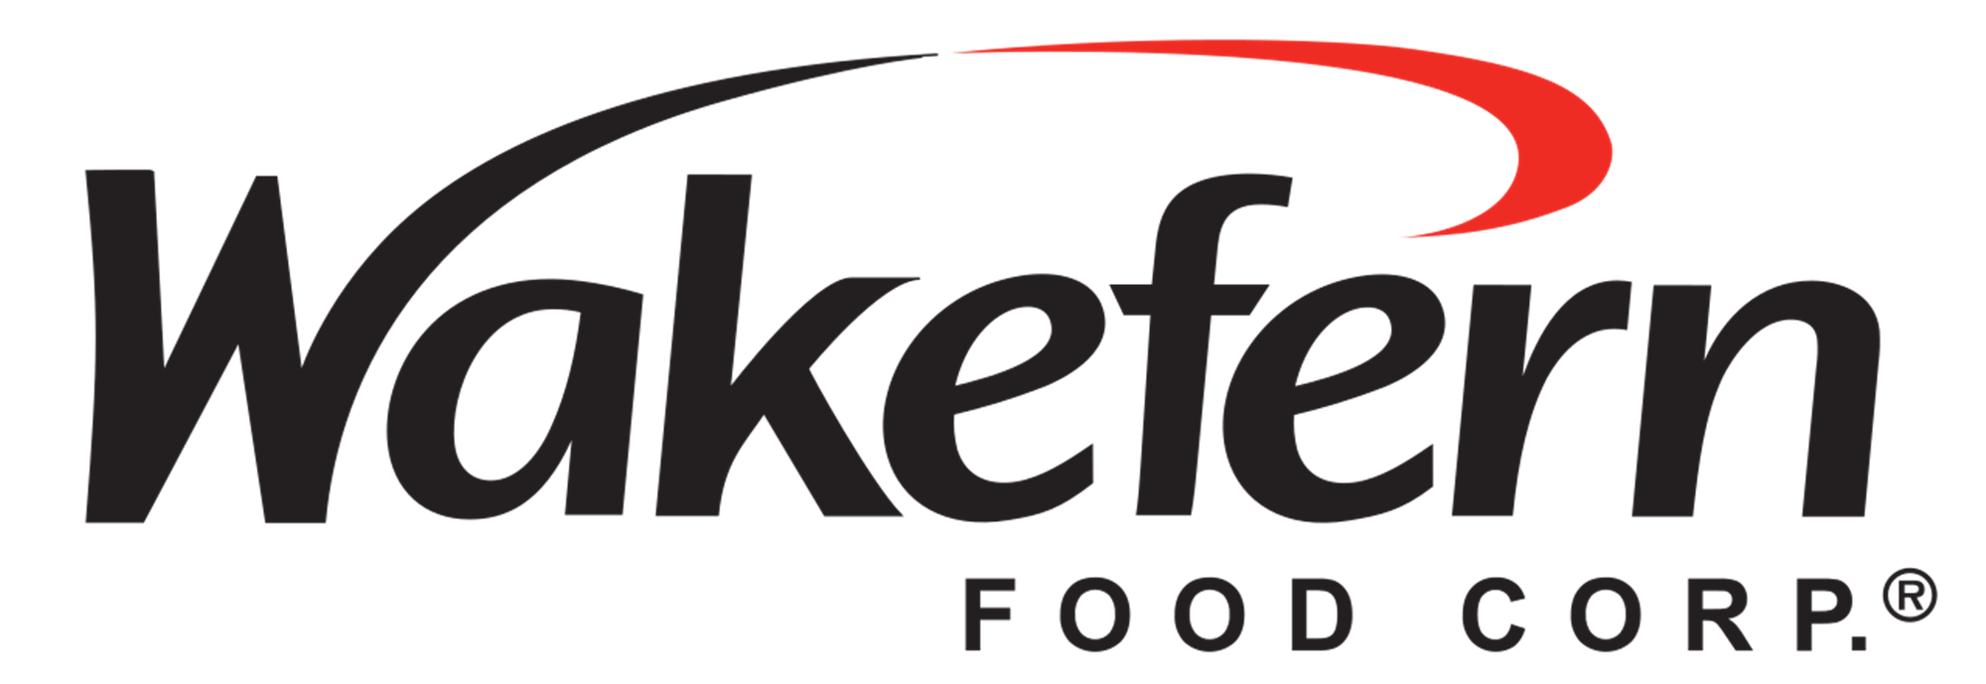 Wakefern logo.png